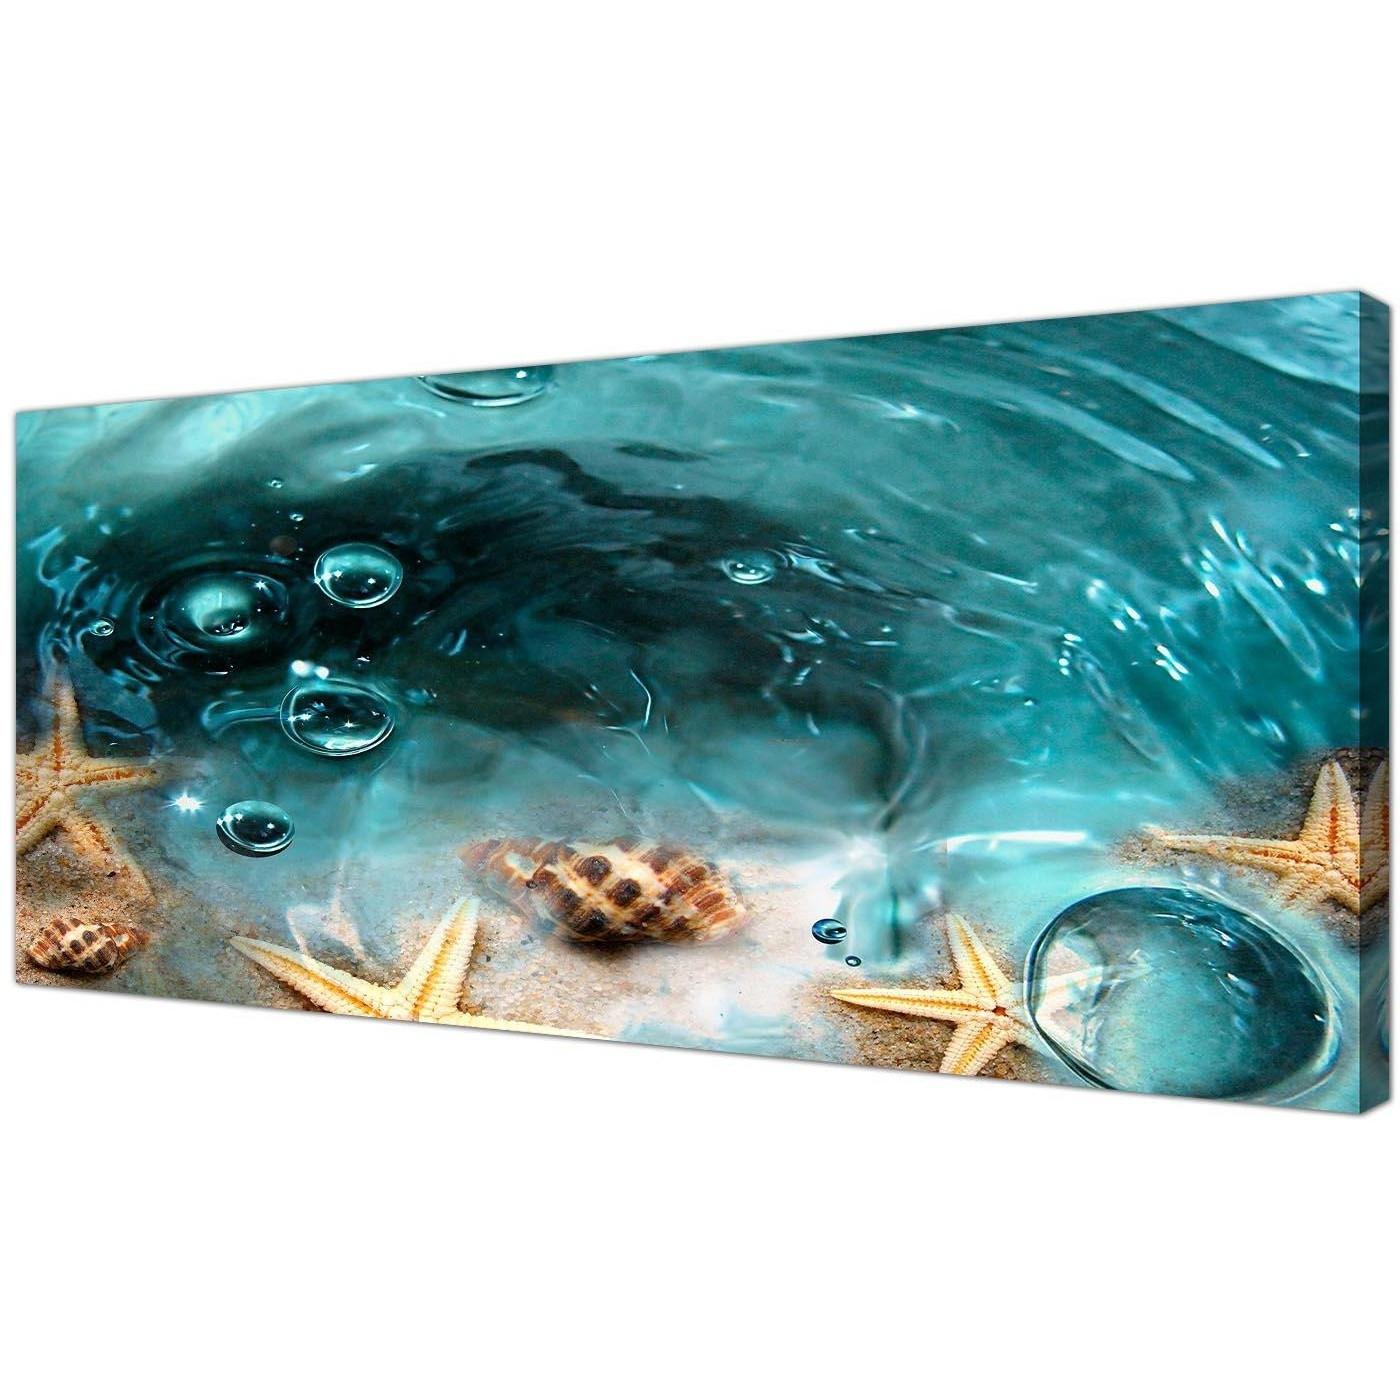 2018 Teal Seaside Starfish In Sand Bathroom Wall Art With Regard To Bathroom Canvas Wall Art (View 5 of 15)